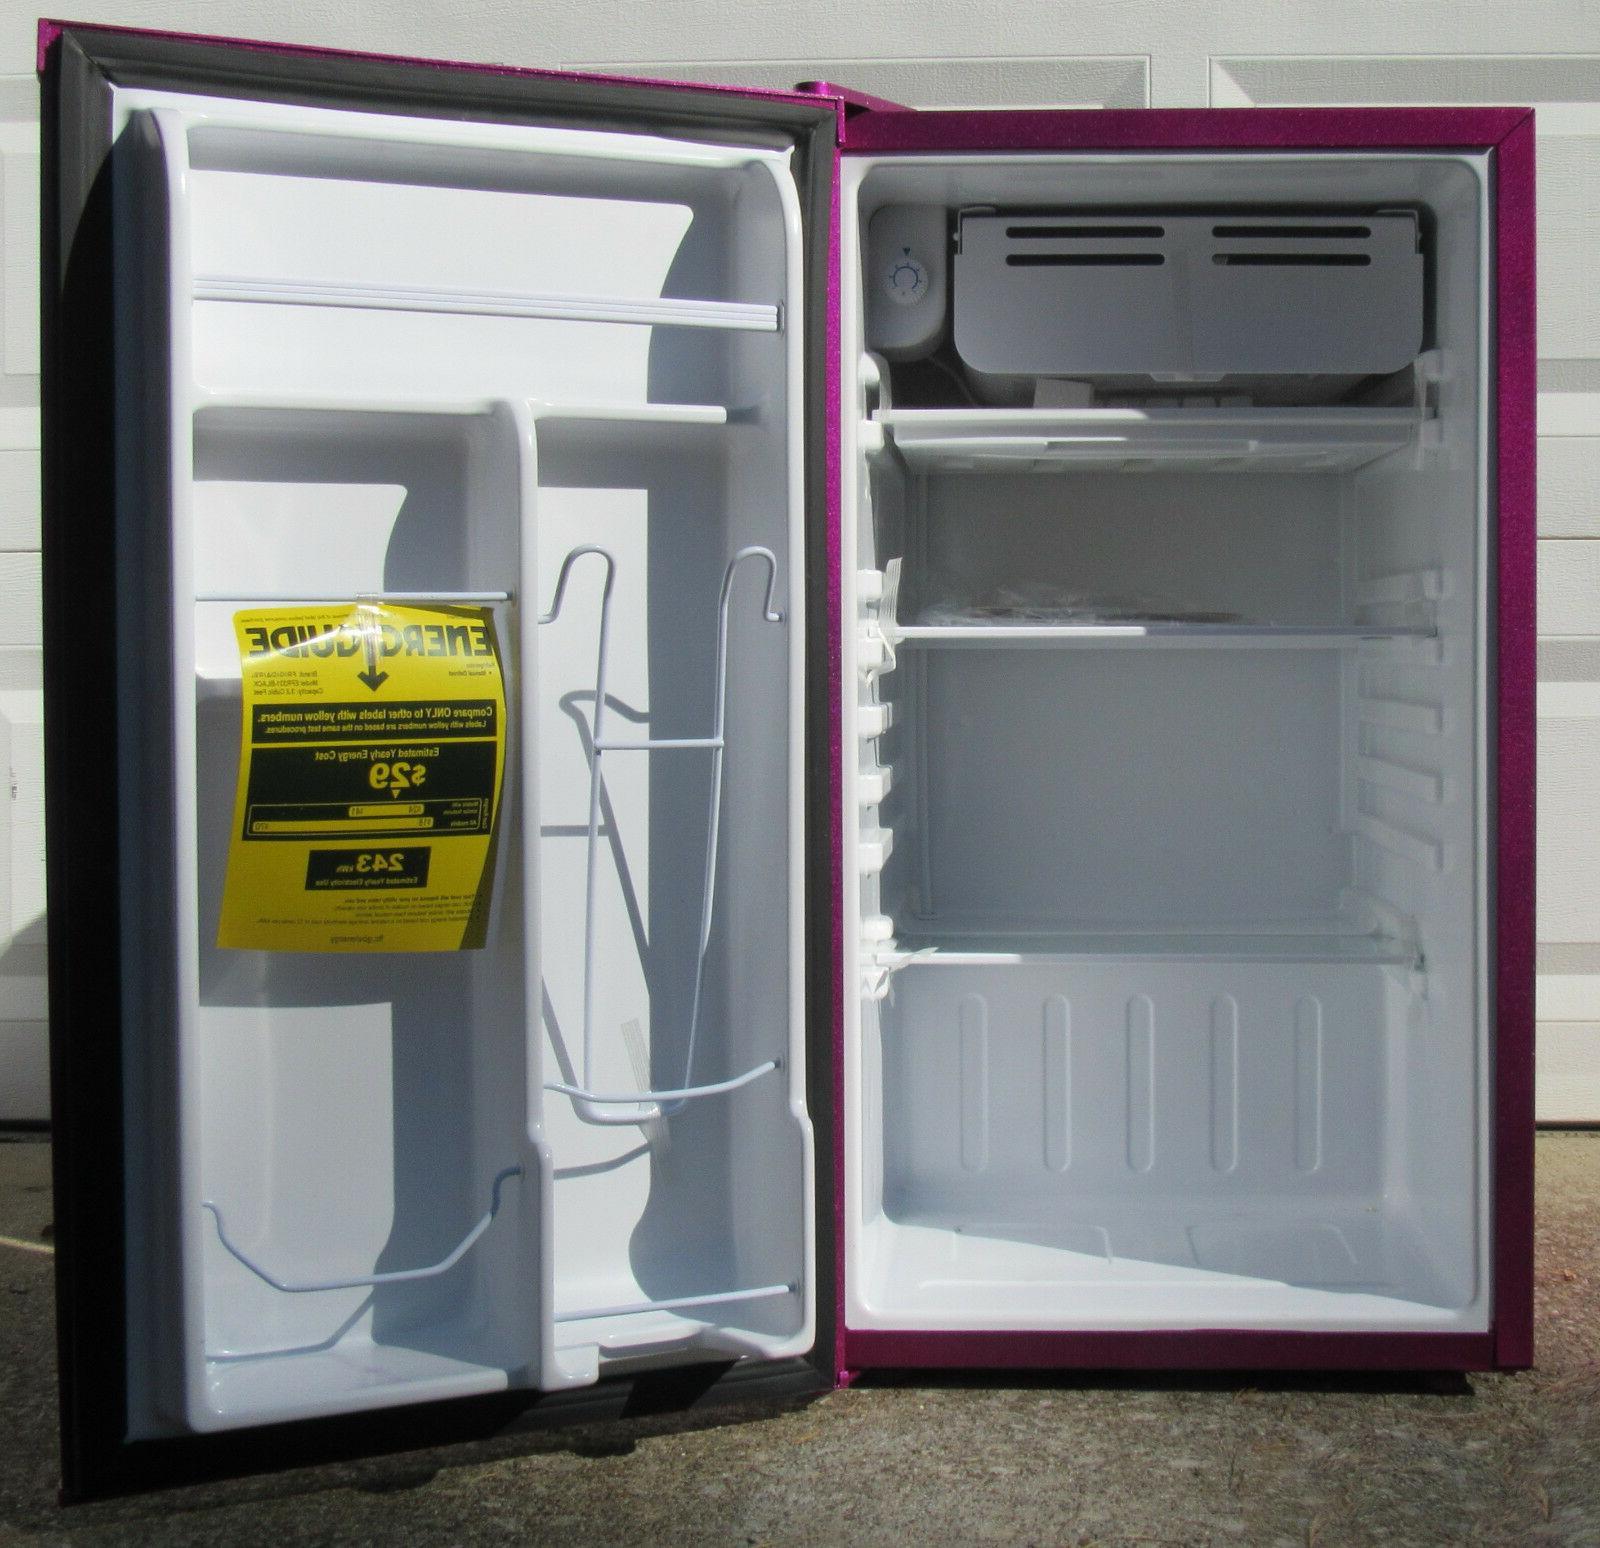 Retro Mini Fridge 3.2 Ft, Raspberry Ice KitchenAid